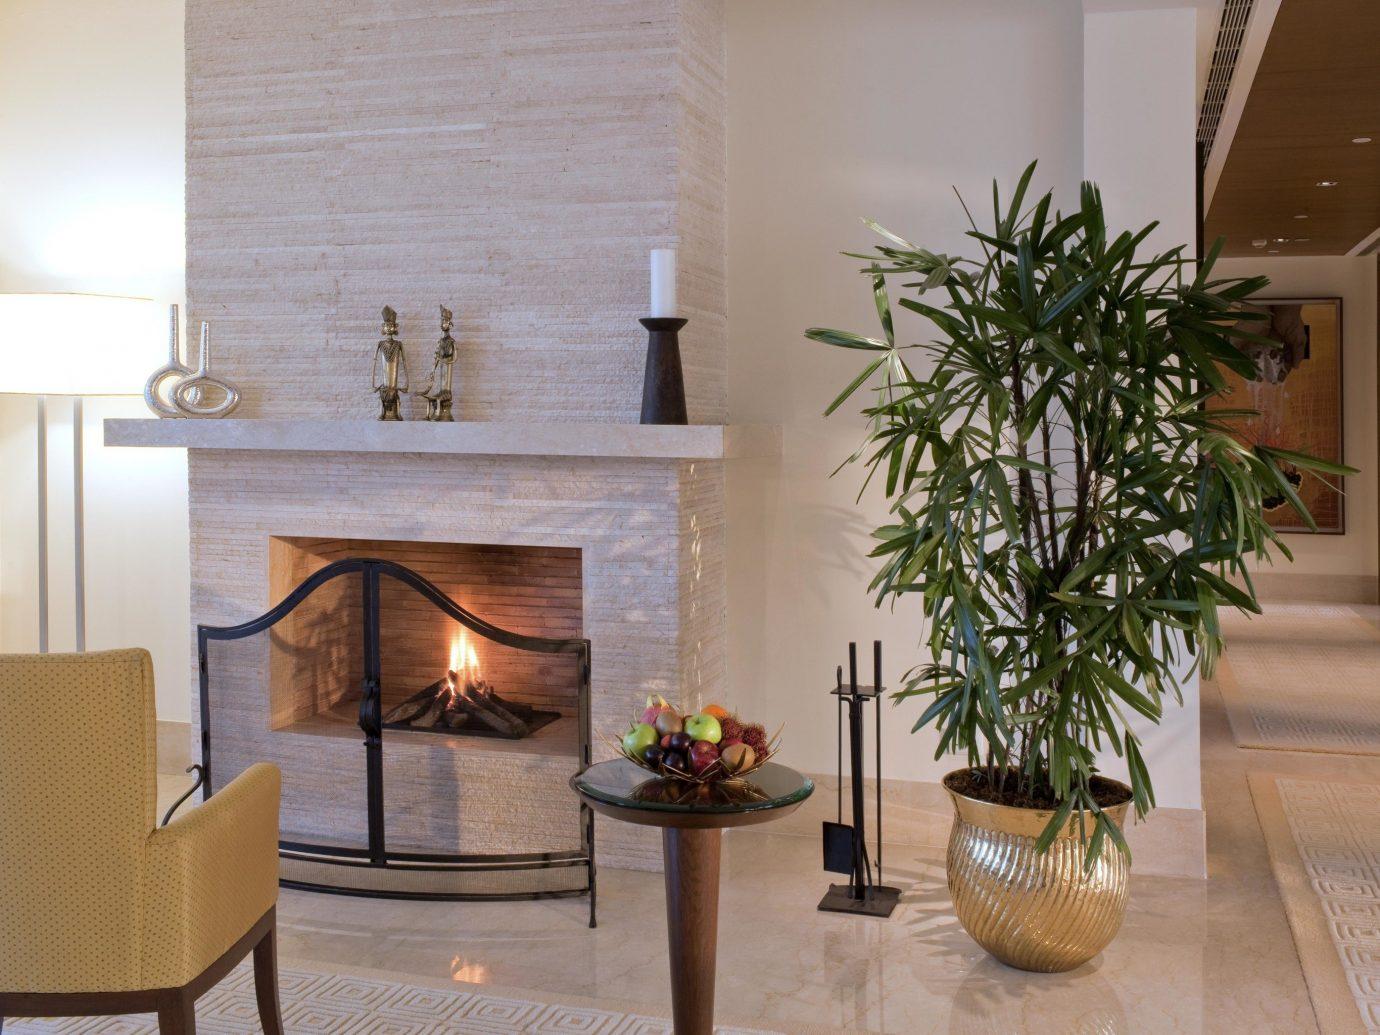 Hotels Luxury Travel indoor living room Living room floor hearth interior design home Fireplace Lobby flooring plant decor furniture table area